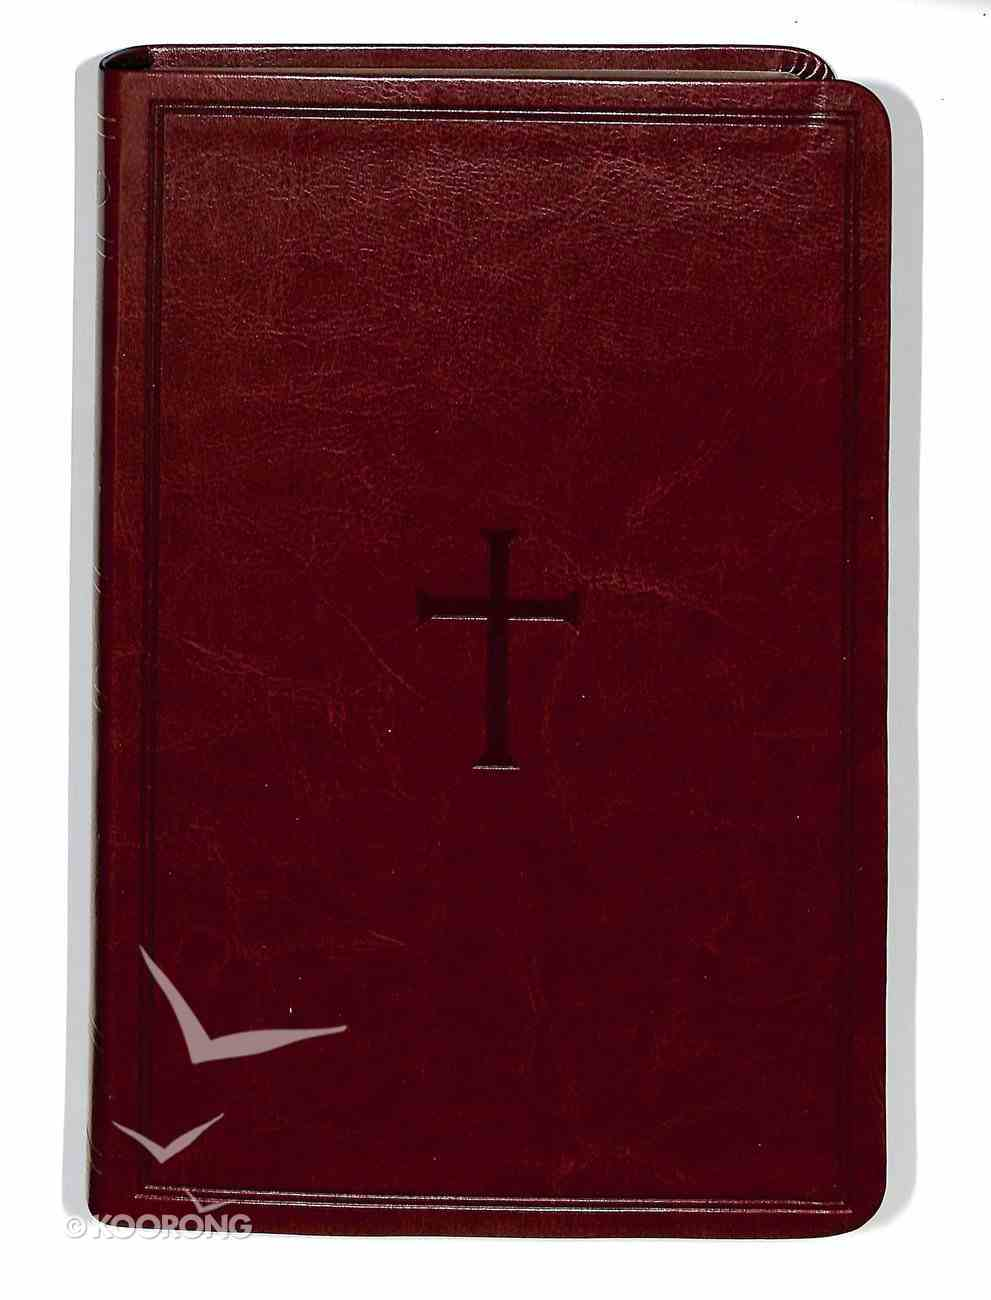 NKJV Large Print Personal Size Reference Bible Brown Premium Imitation Leather